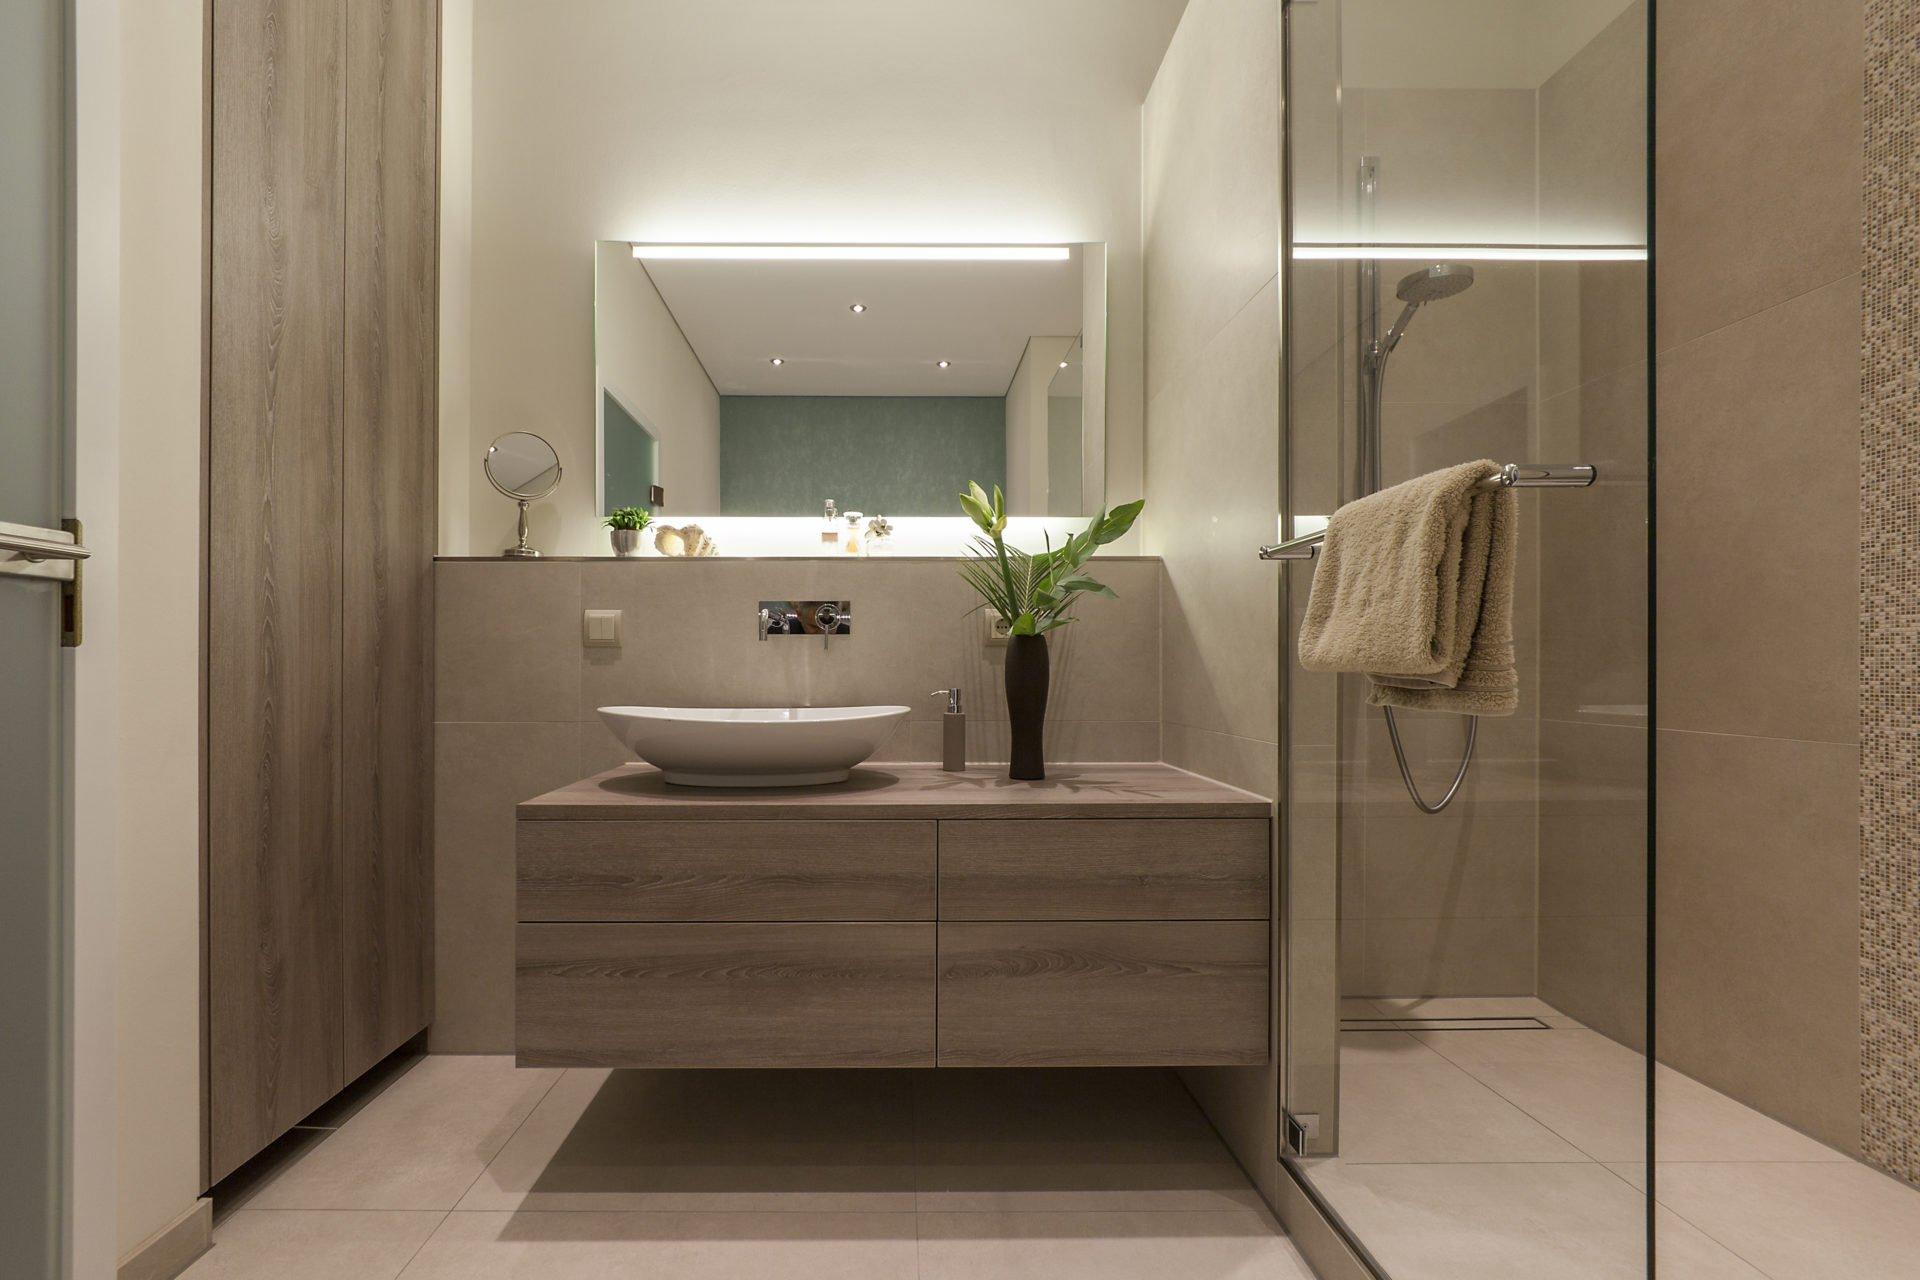 Heizung Badezimmer Waschbecken Referenz Nowak Gmbh